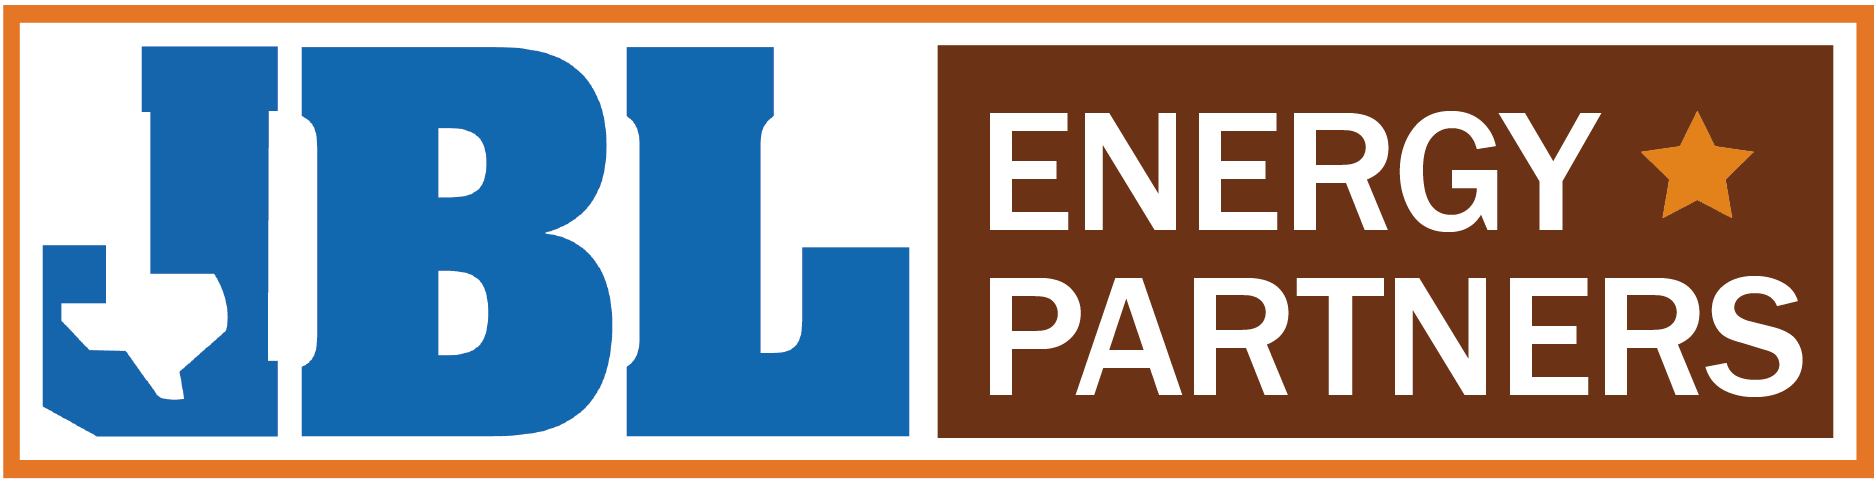 JBL Energy Partners